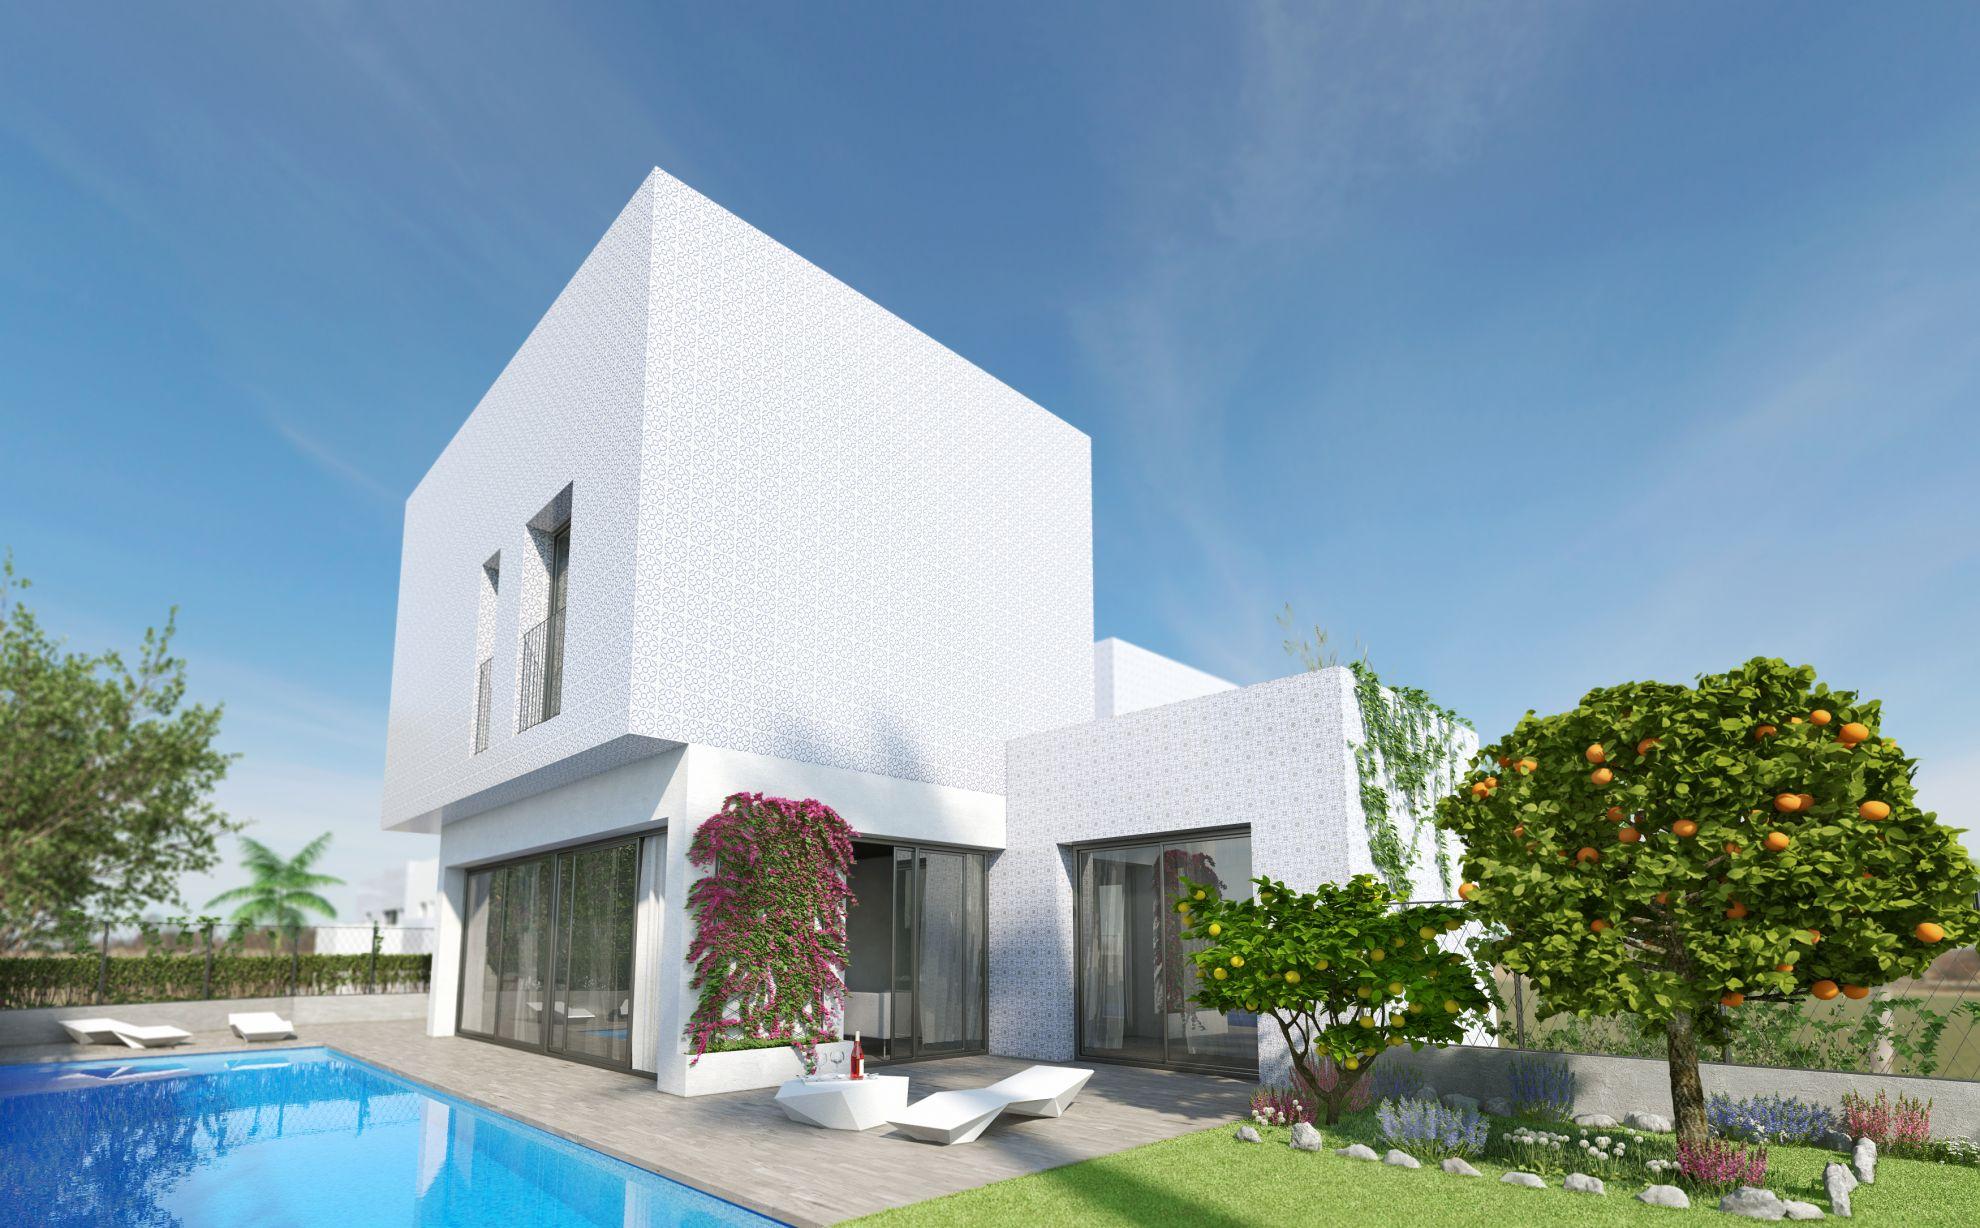 3 bedroom villa with private garden in complex with pool in Villamartín 3